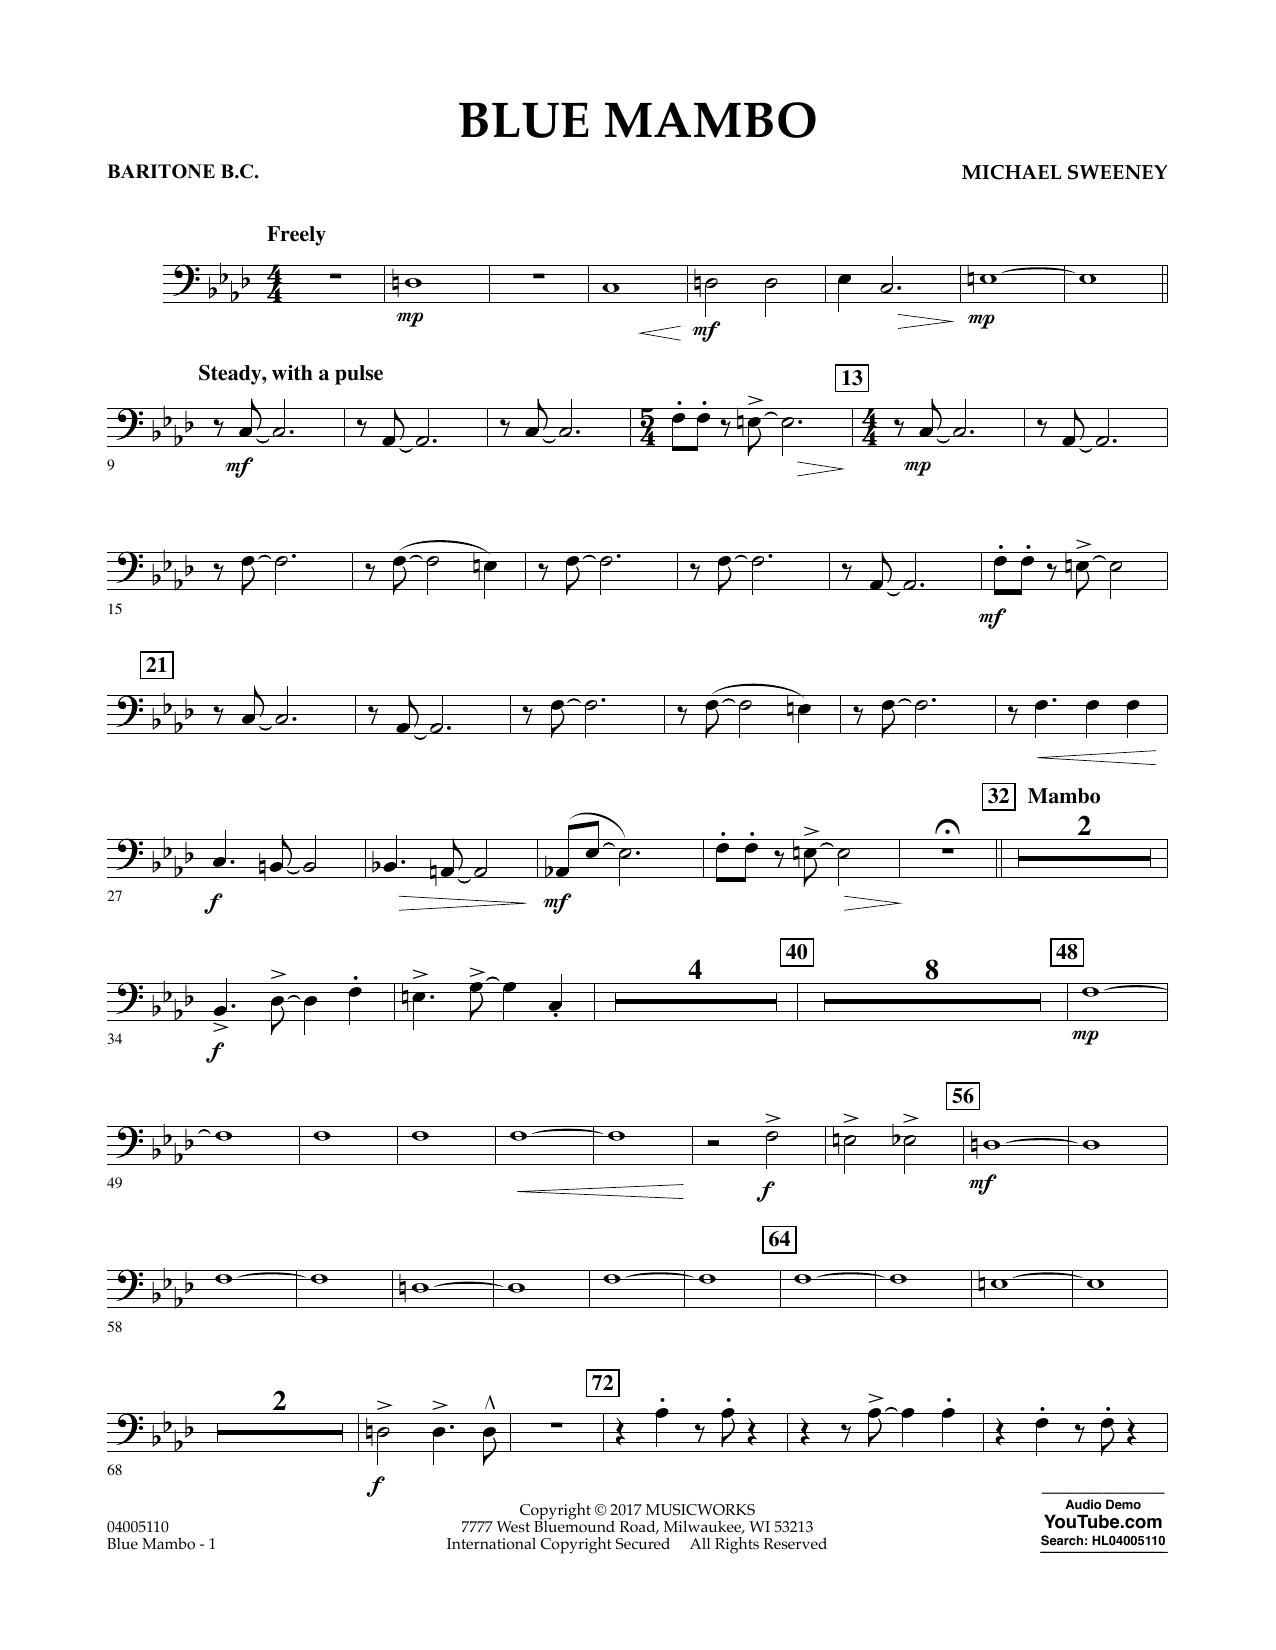 Blue Mambo - Baritone B.C. Sheet Music